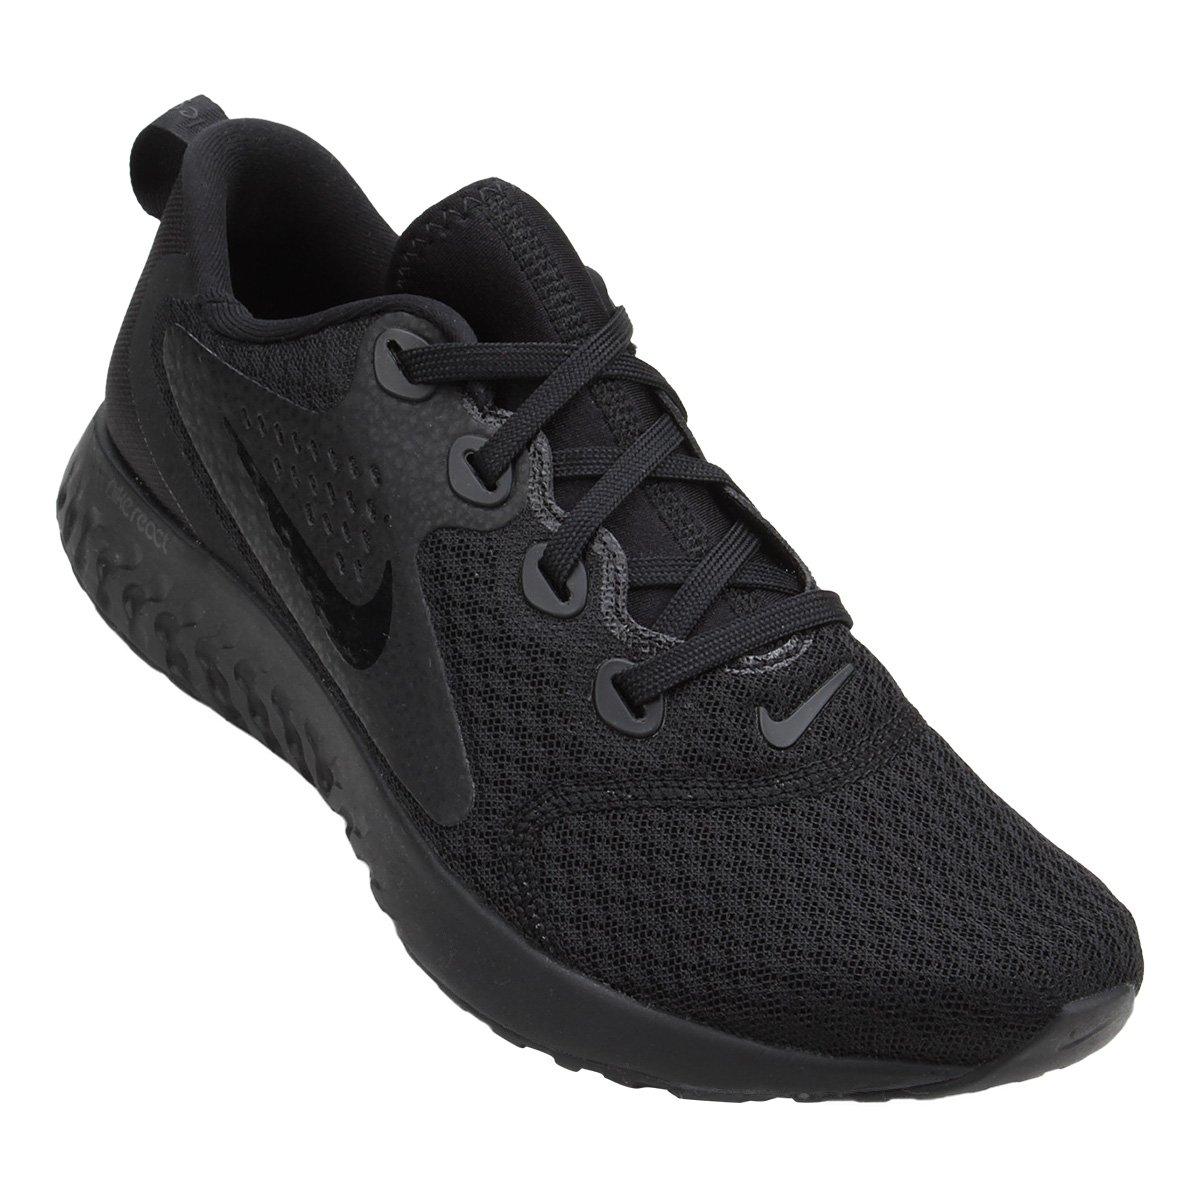 Tênis Nike Legend React Masculino - Preto - Compre Agora  551d22bb81481